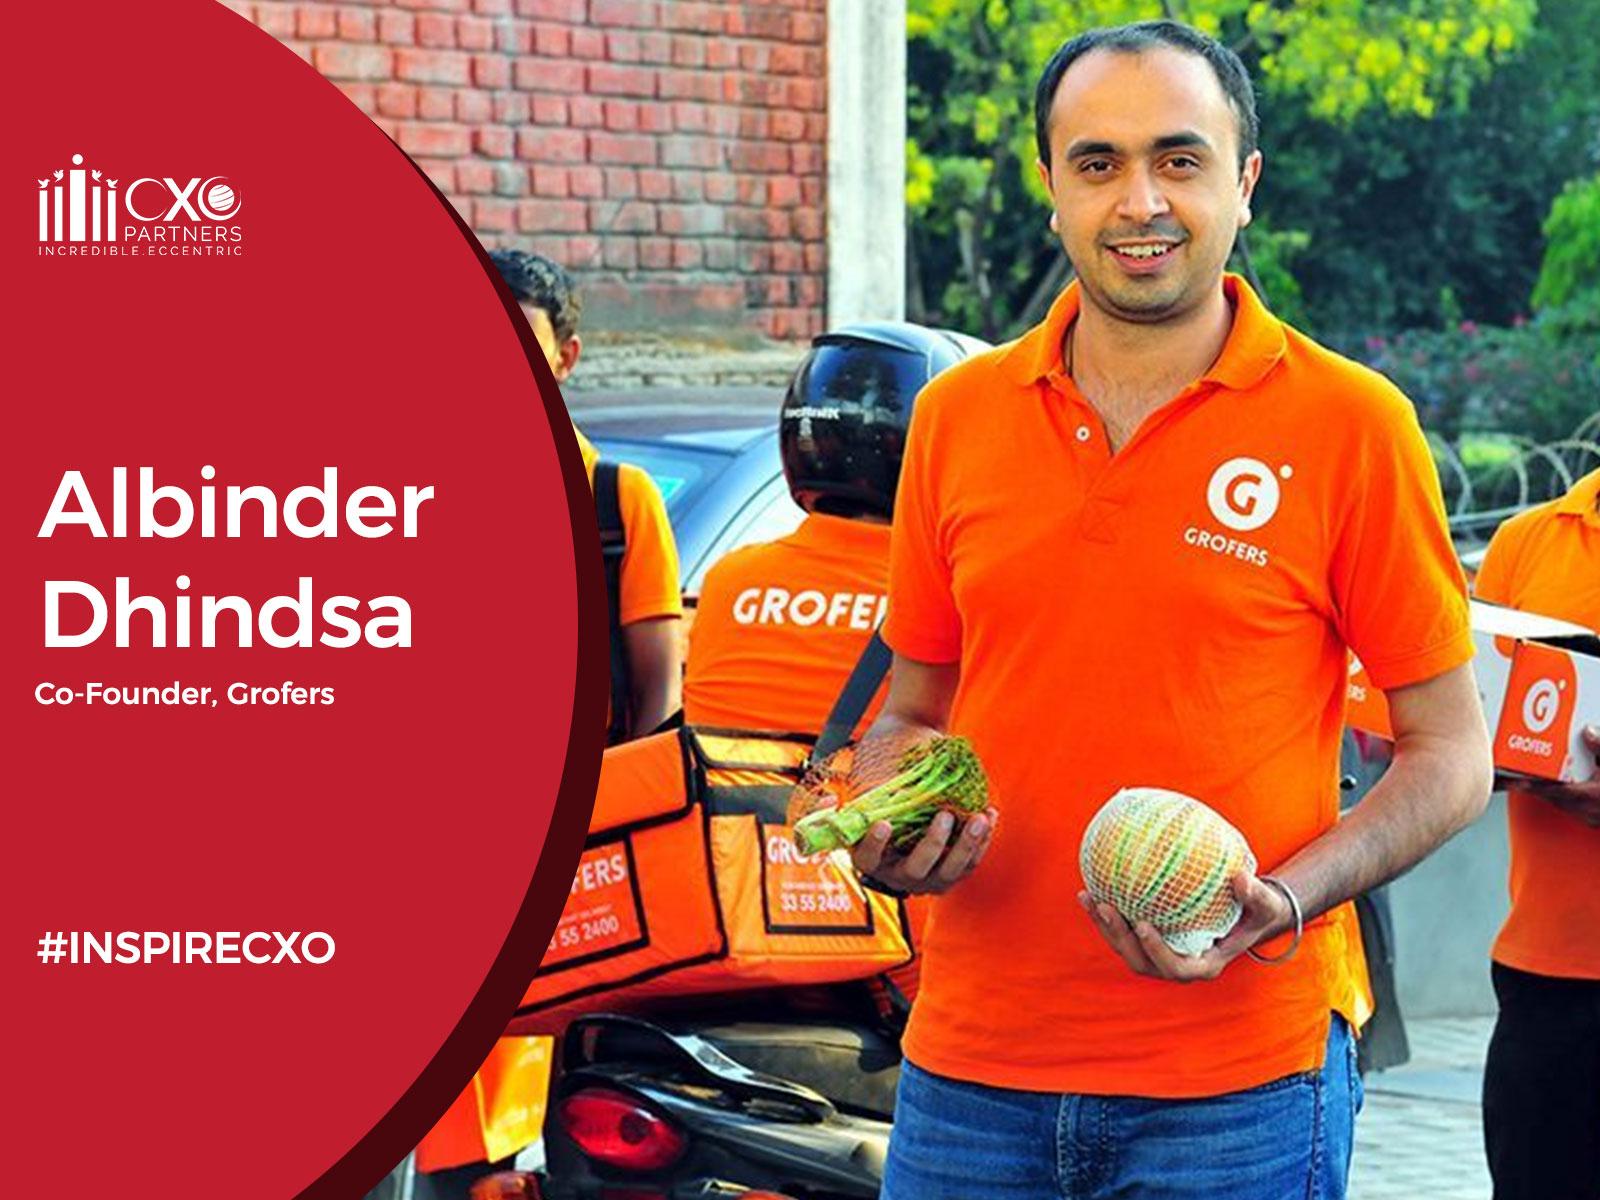 INSPIRECXO Albinder Dhindsa Grofers